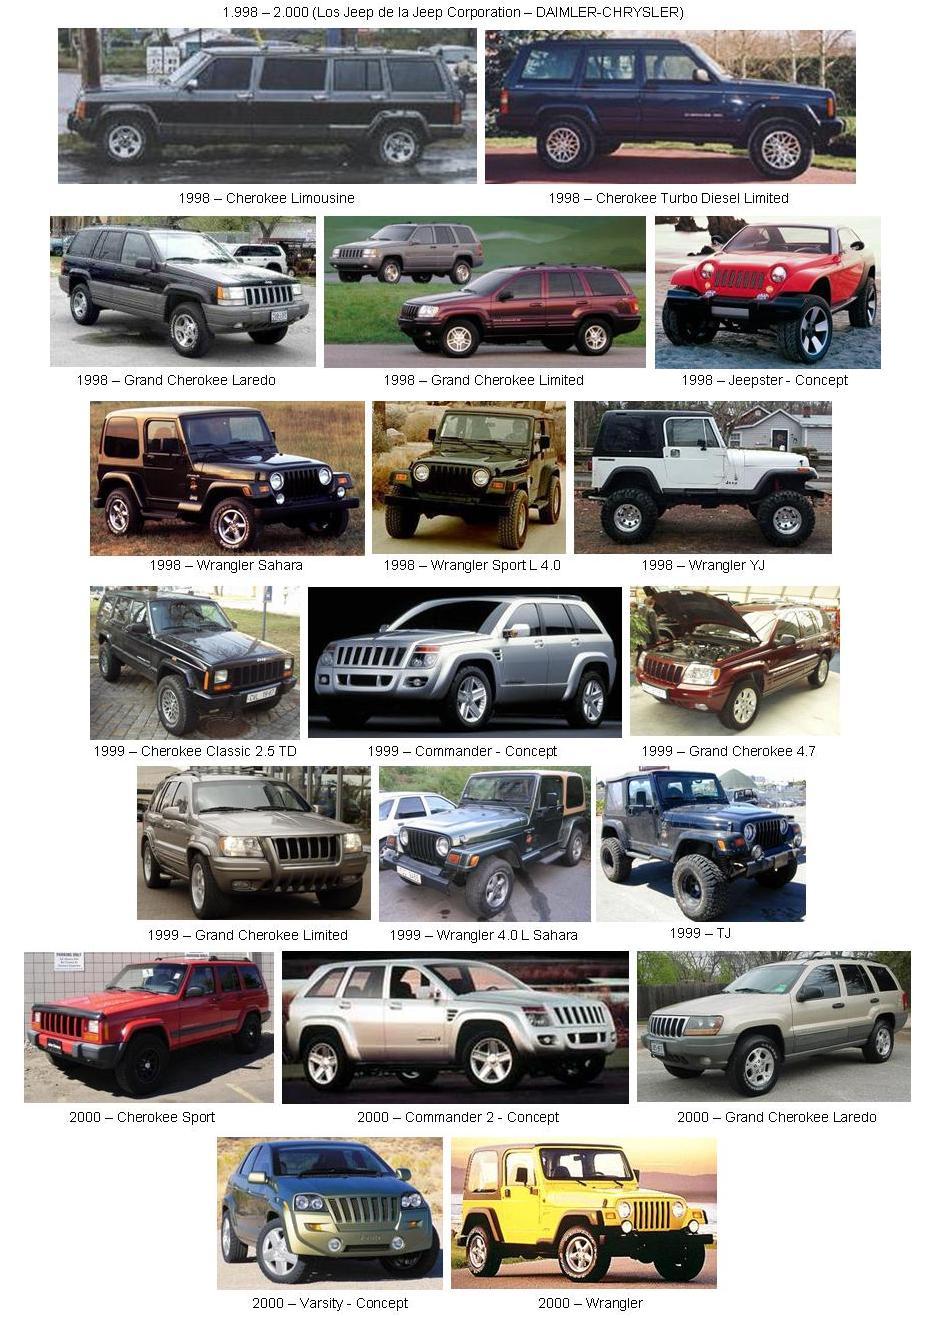 Historia Gráfica de la Jeep JEEP-07-(1998-2000)-(Jeep%20Corporation%20-%20Daimler-Chrysler)